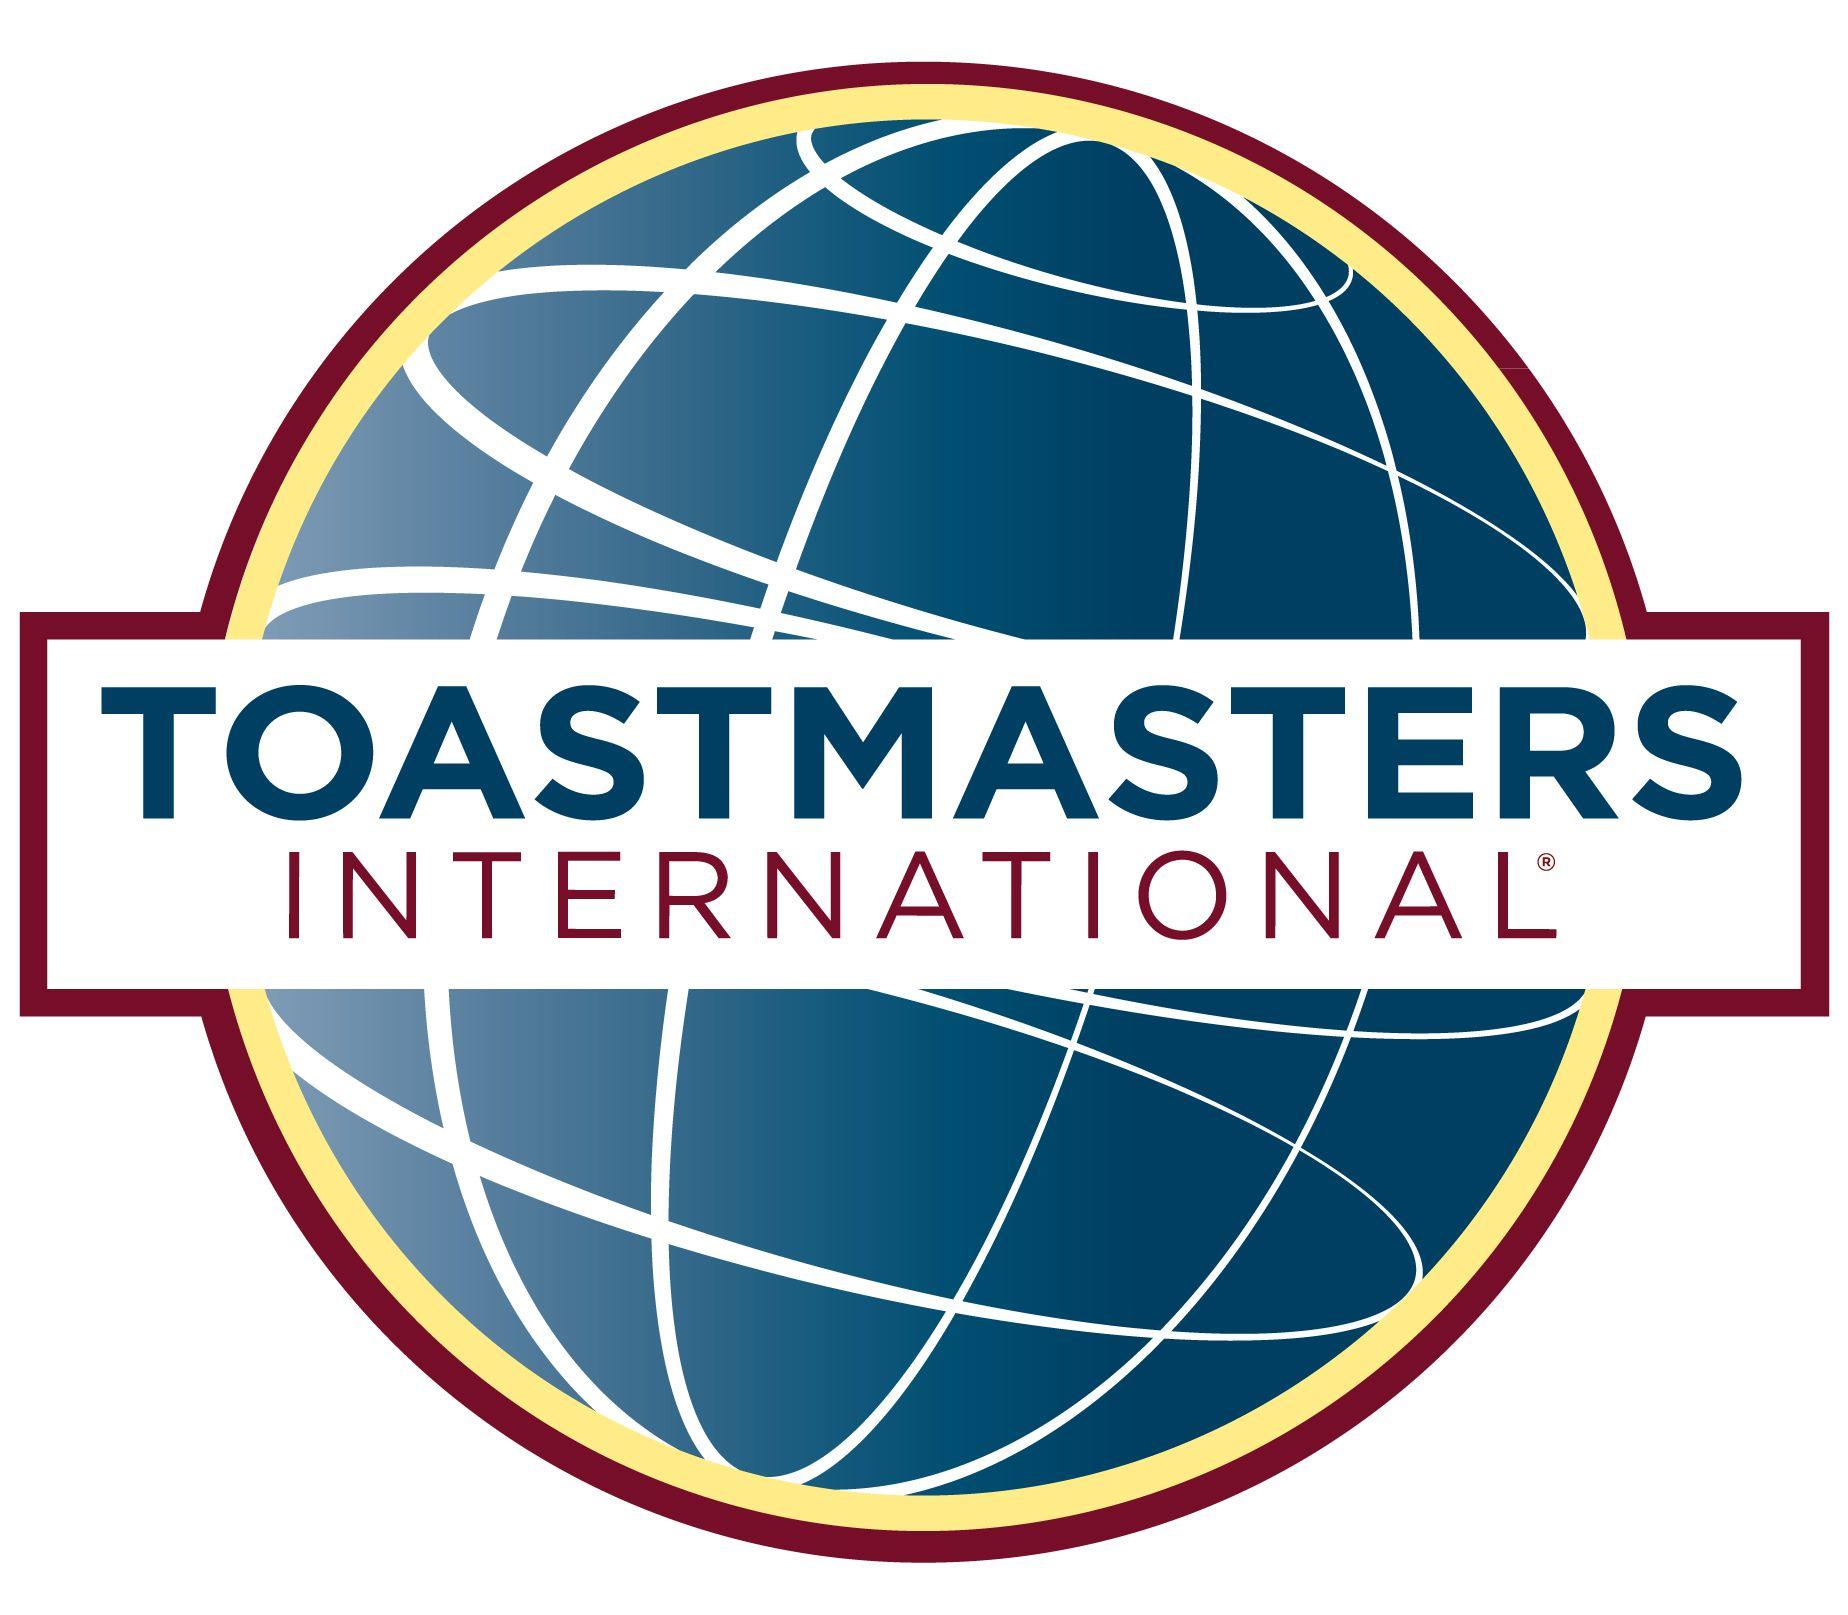 Toastmasters in Spokane and Coeur d'Alene